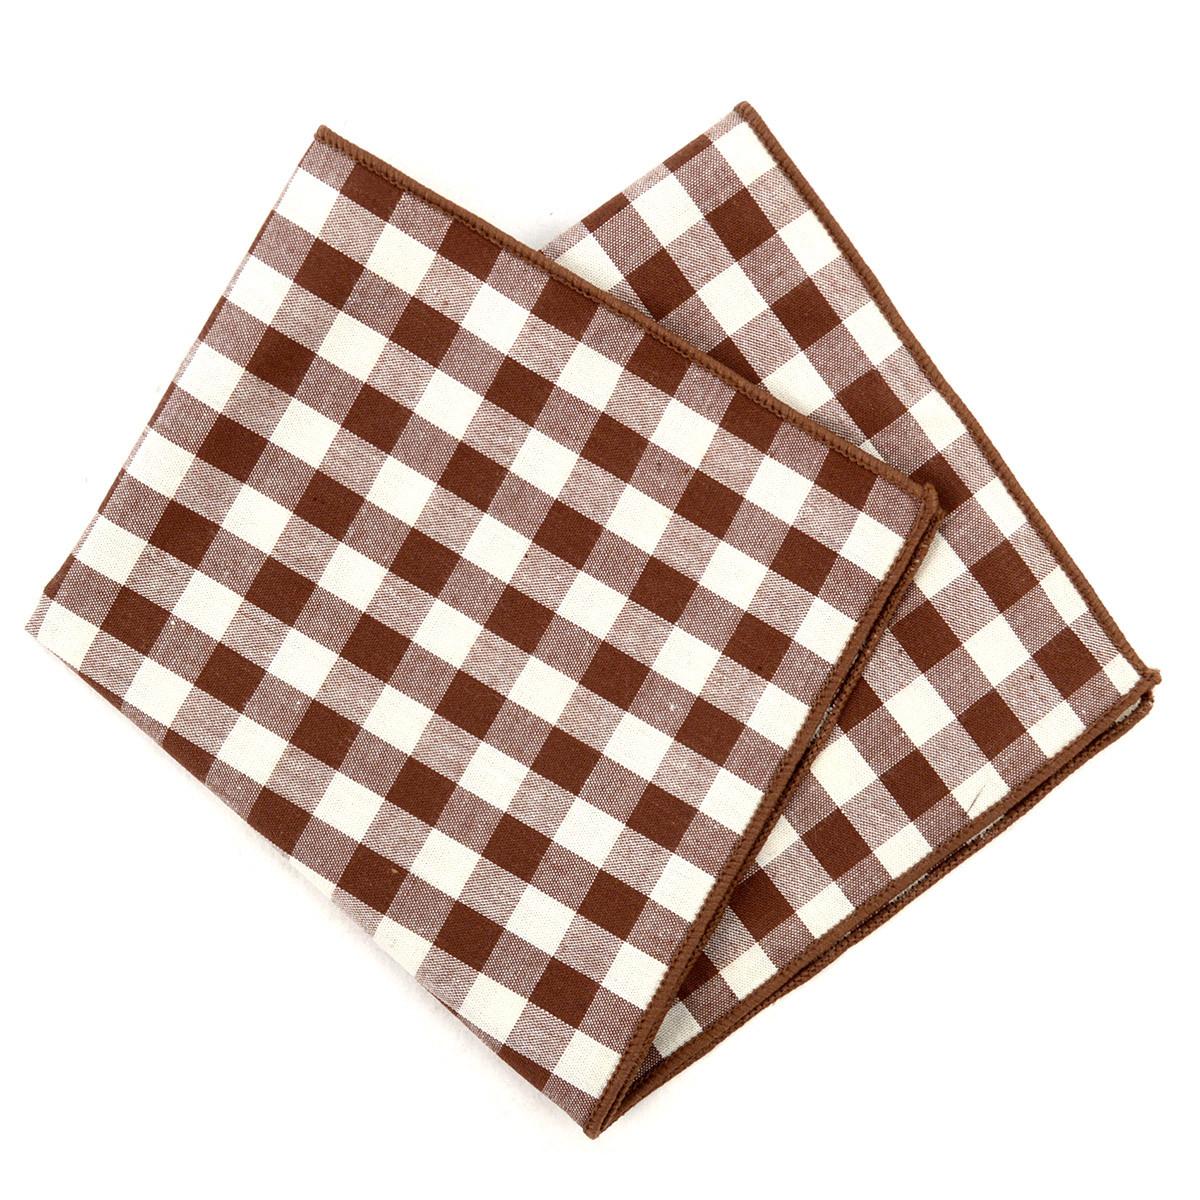 12pc Classic Plaid 100% Cotton Checked Pocket Square Handkerchiefs